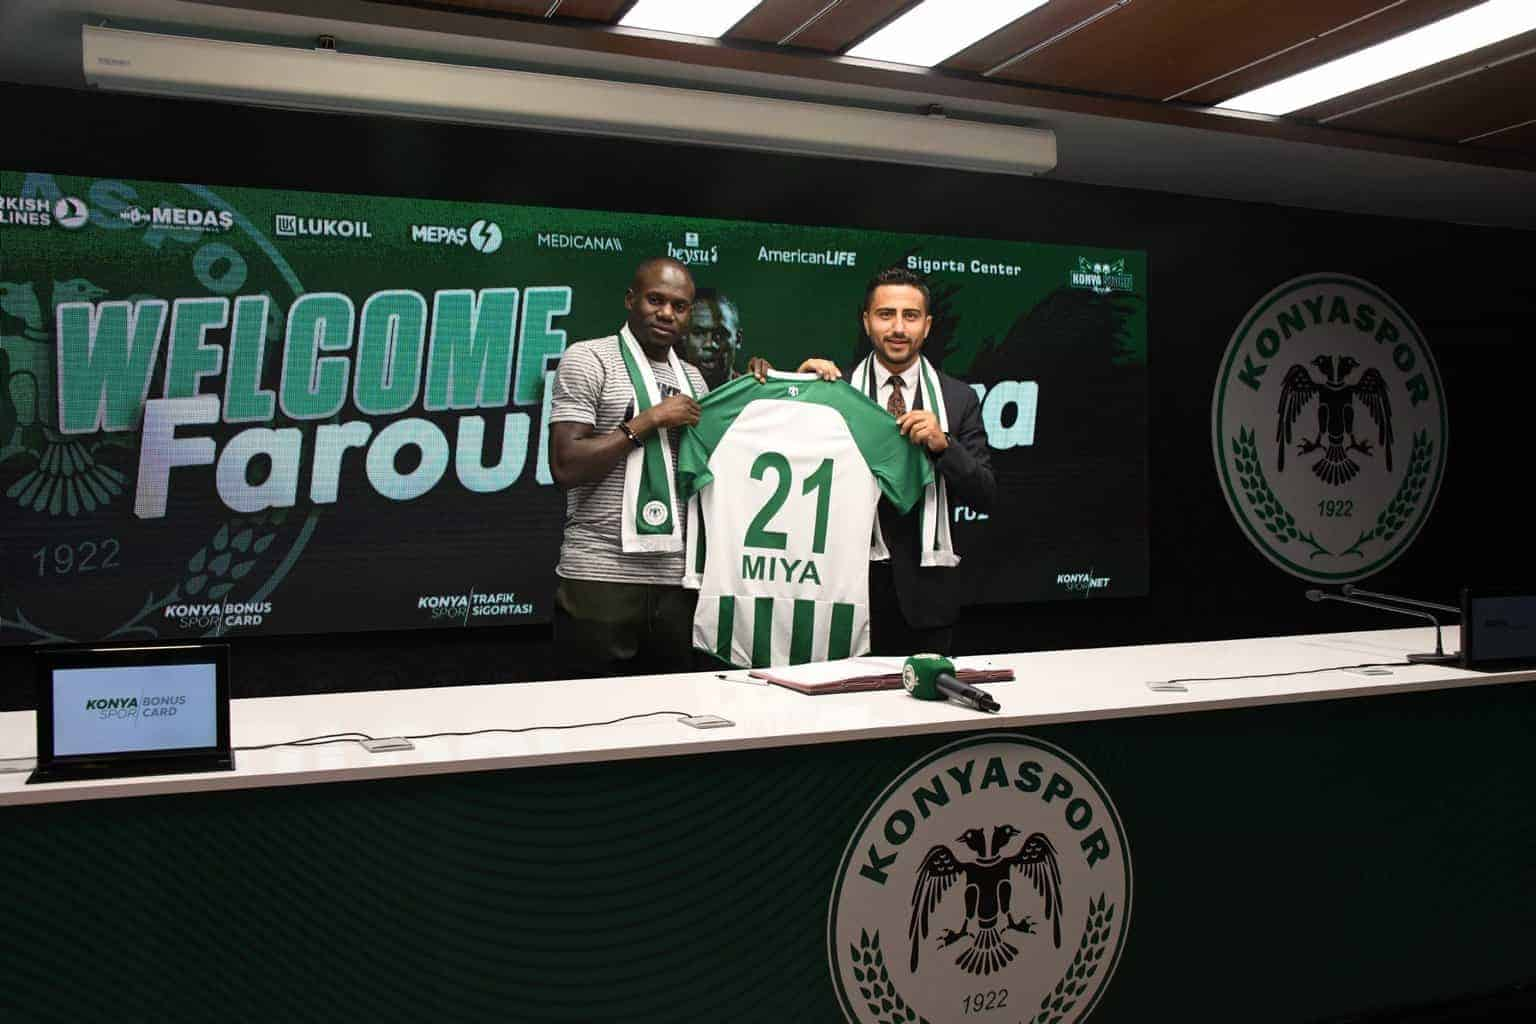 Gorica transferirala Miyu u Konyaspor